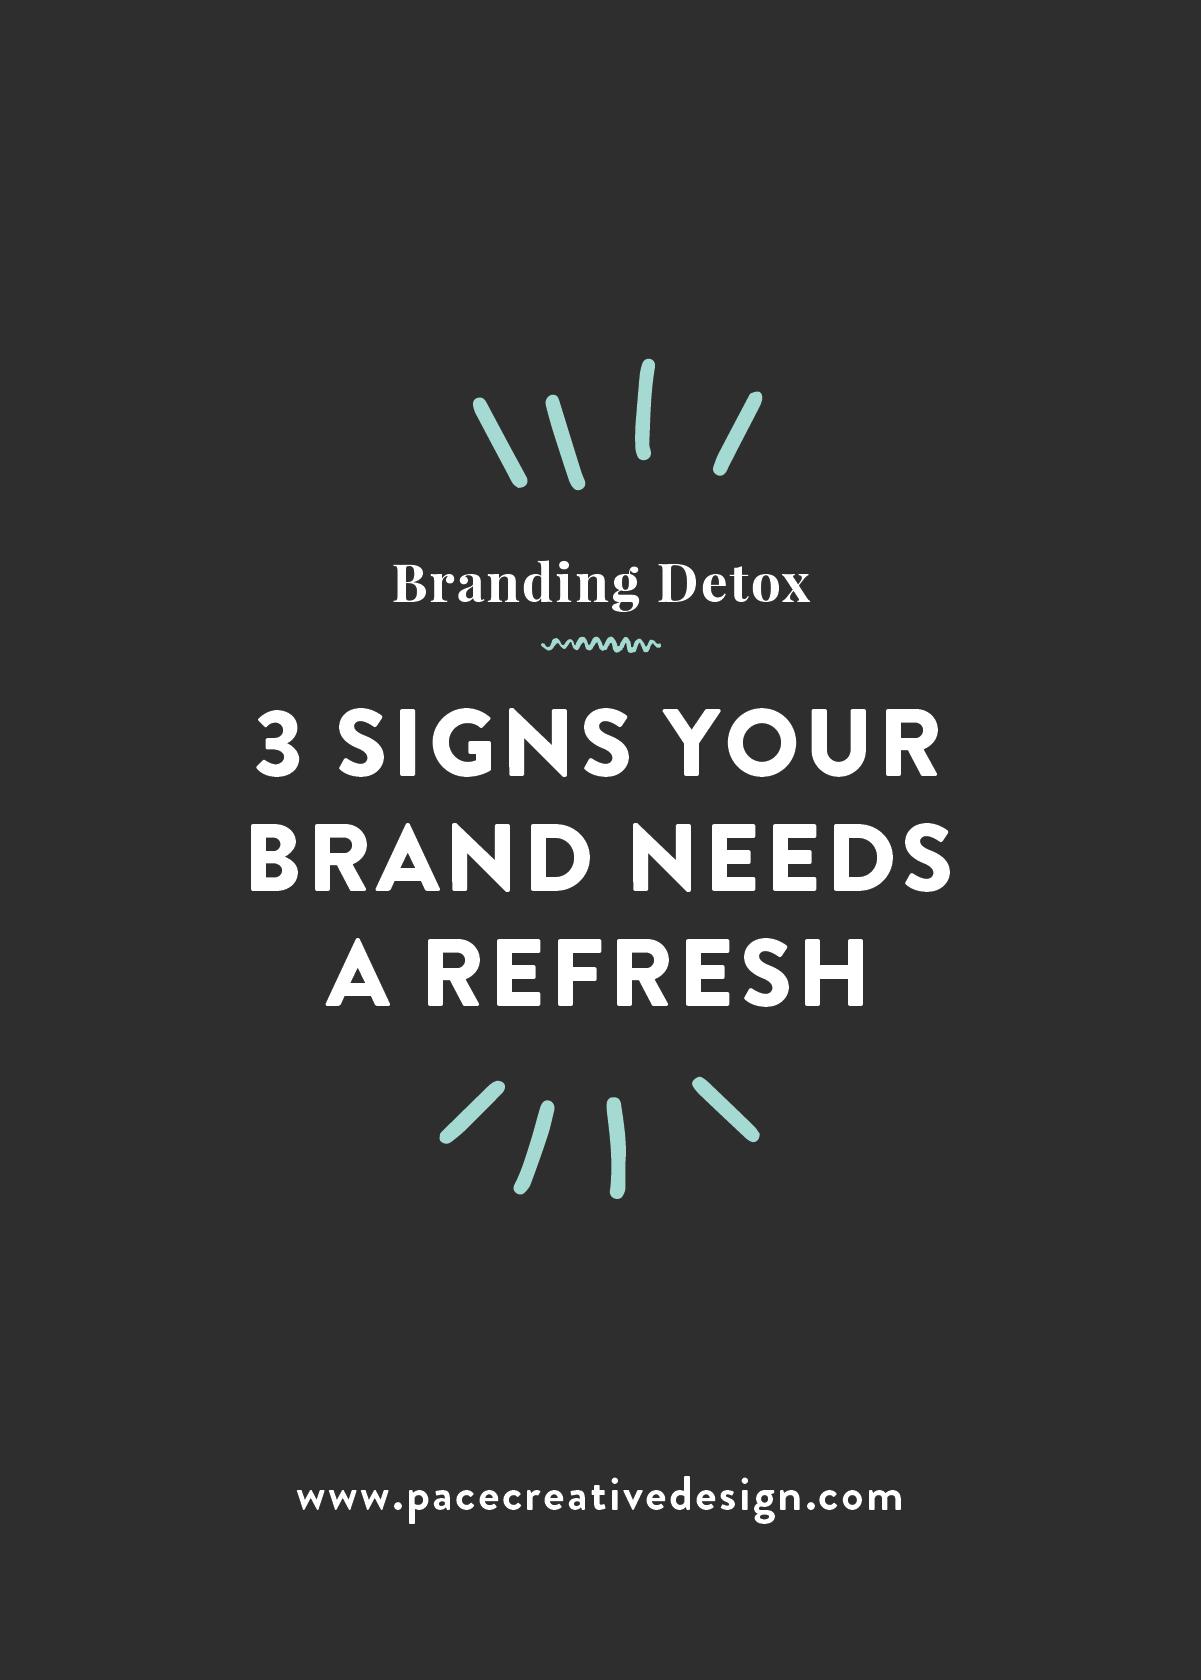 Branding Detox: 3 Signs Your Brand Needs a Refresh   Pace Creative Design Studio